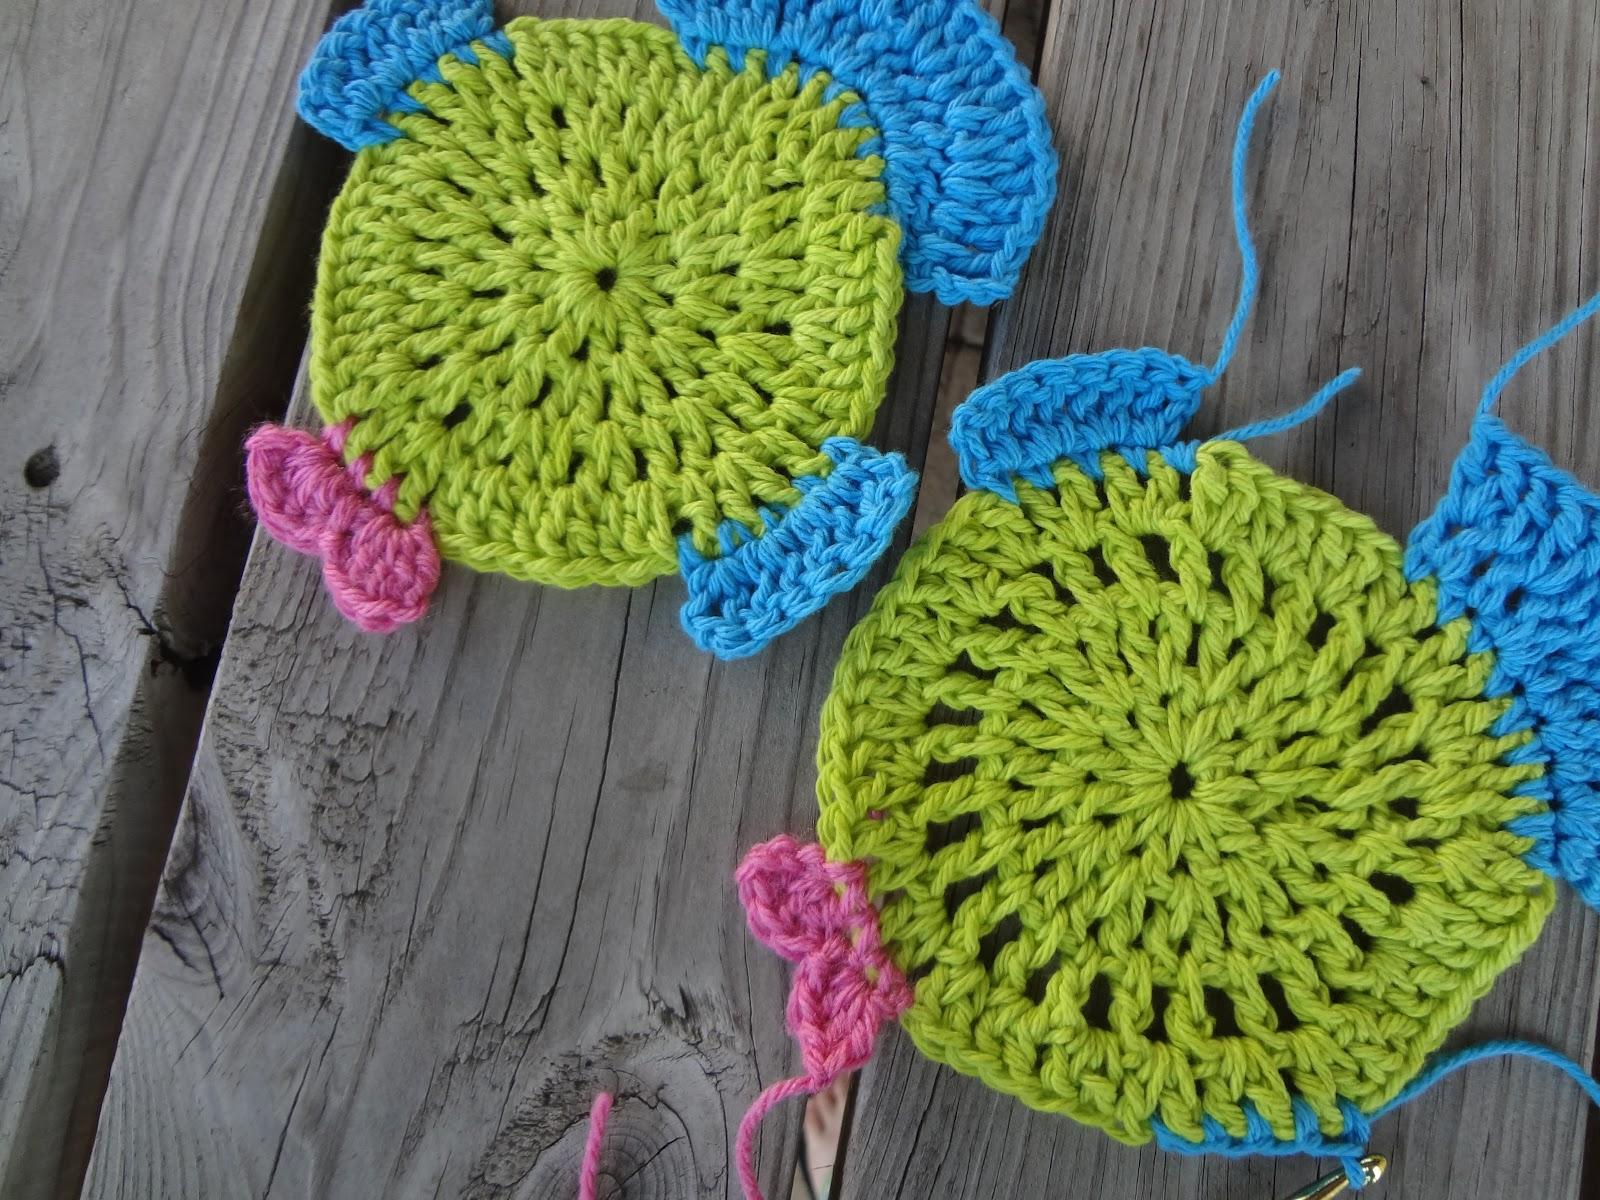 Free Crochet Pattern For Fish : Fiber Flux: Free Crochet Pattern...Fabulous Fish Dishcloth!